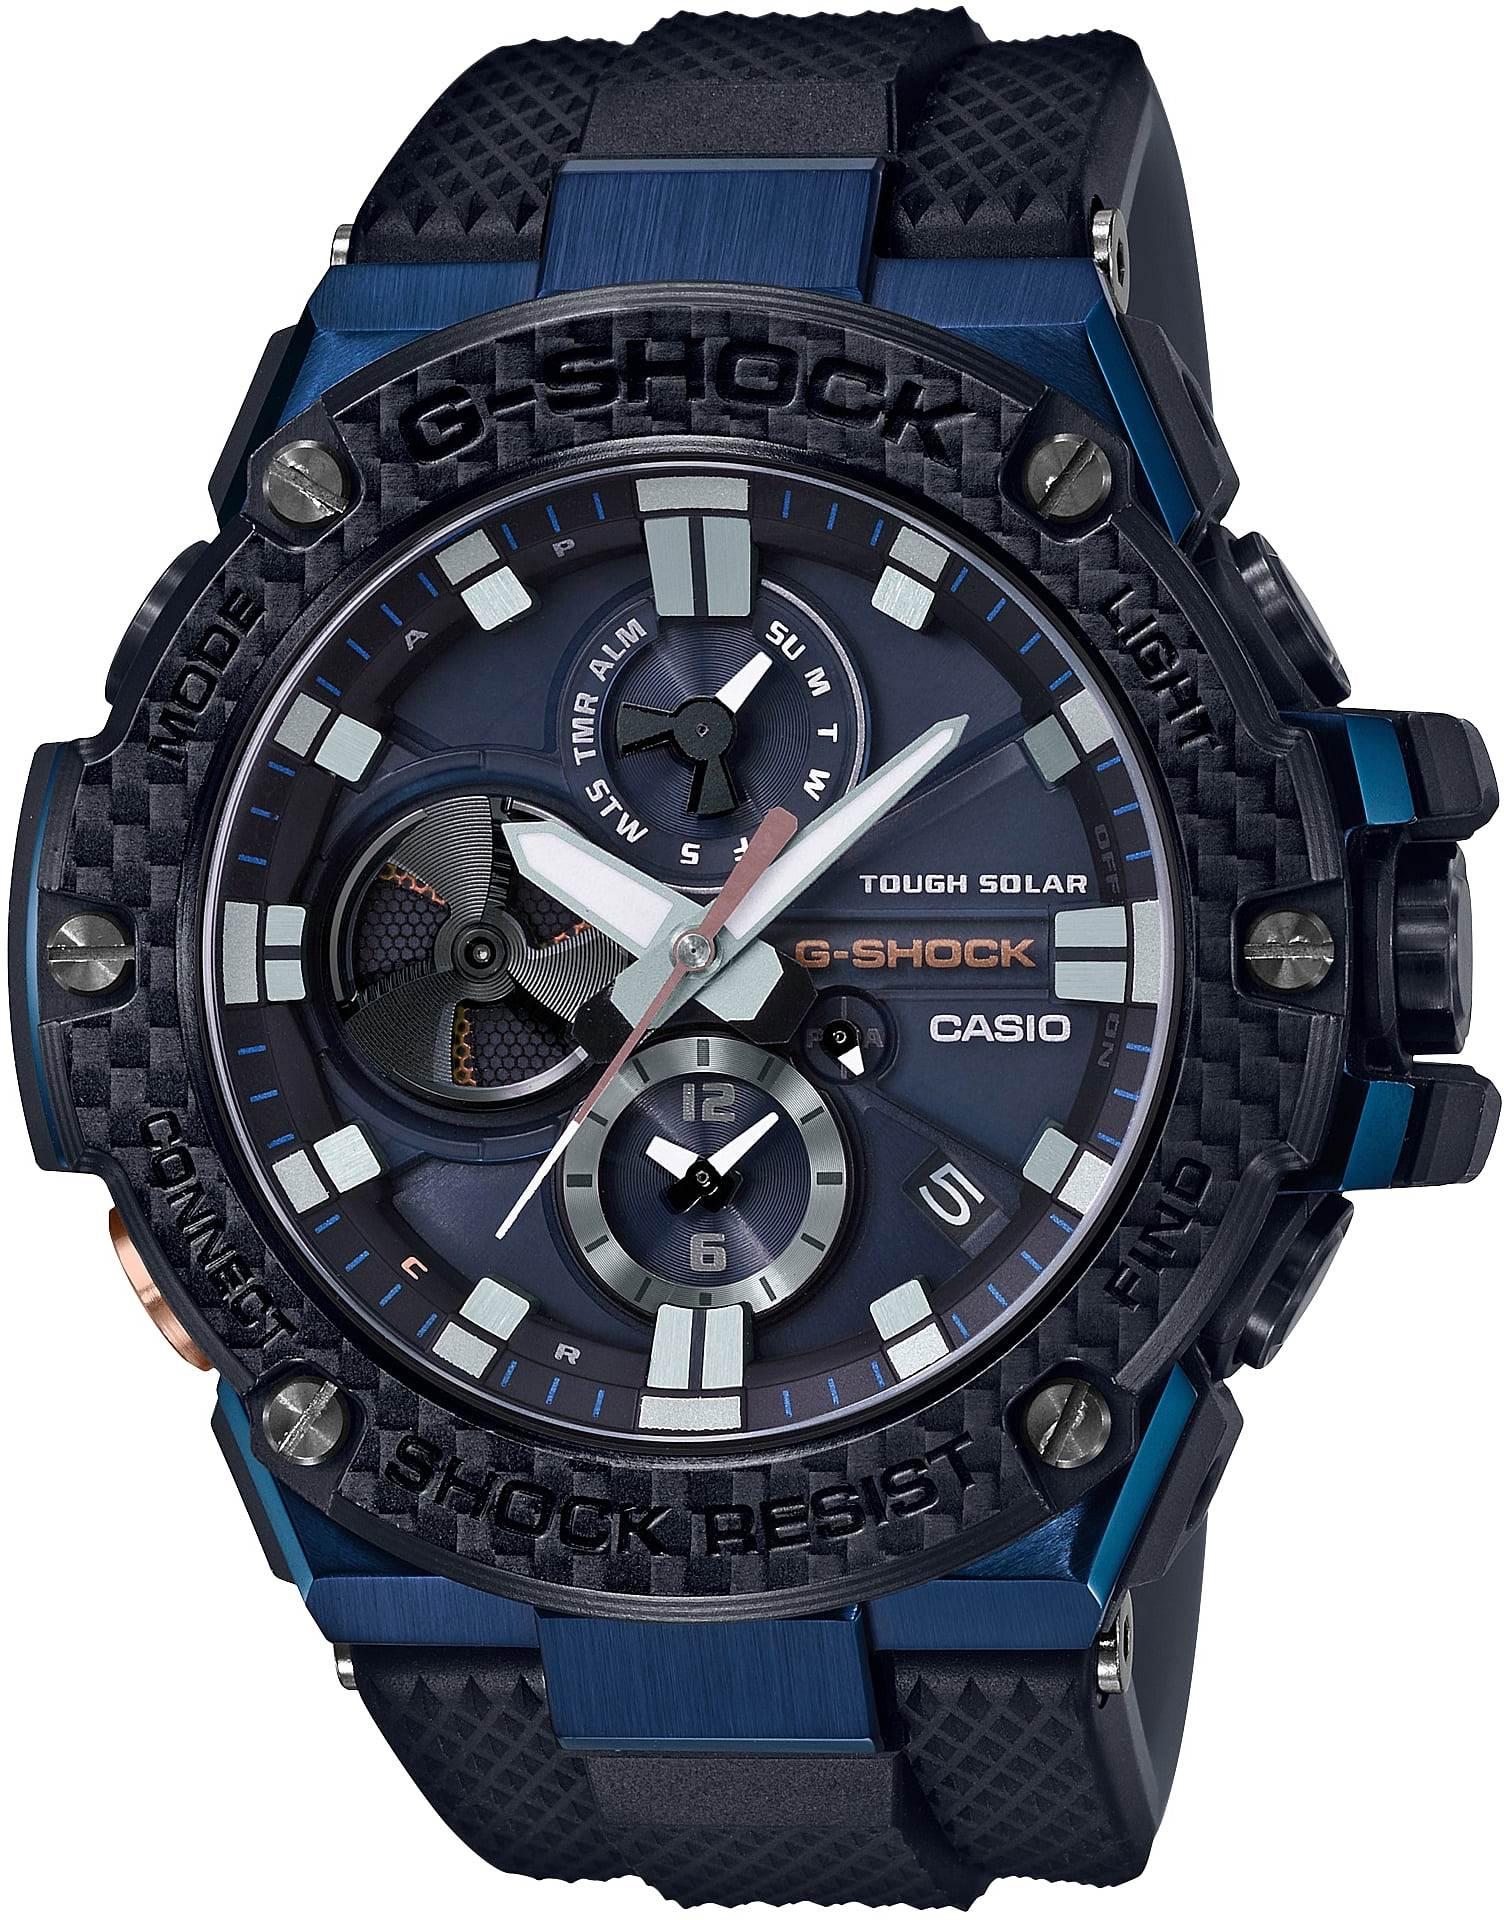 zegarek-meski-g-shock-g-steel-radio-controlled-gst-w130bc-1a3er